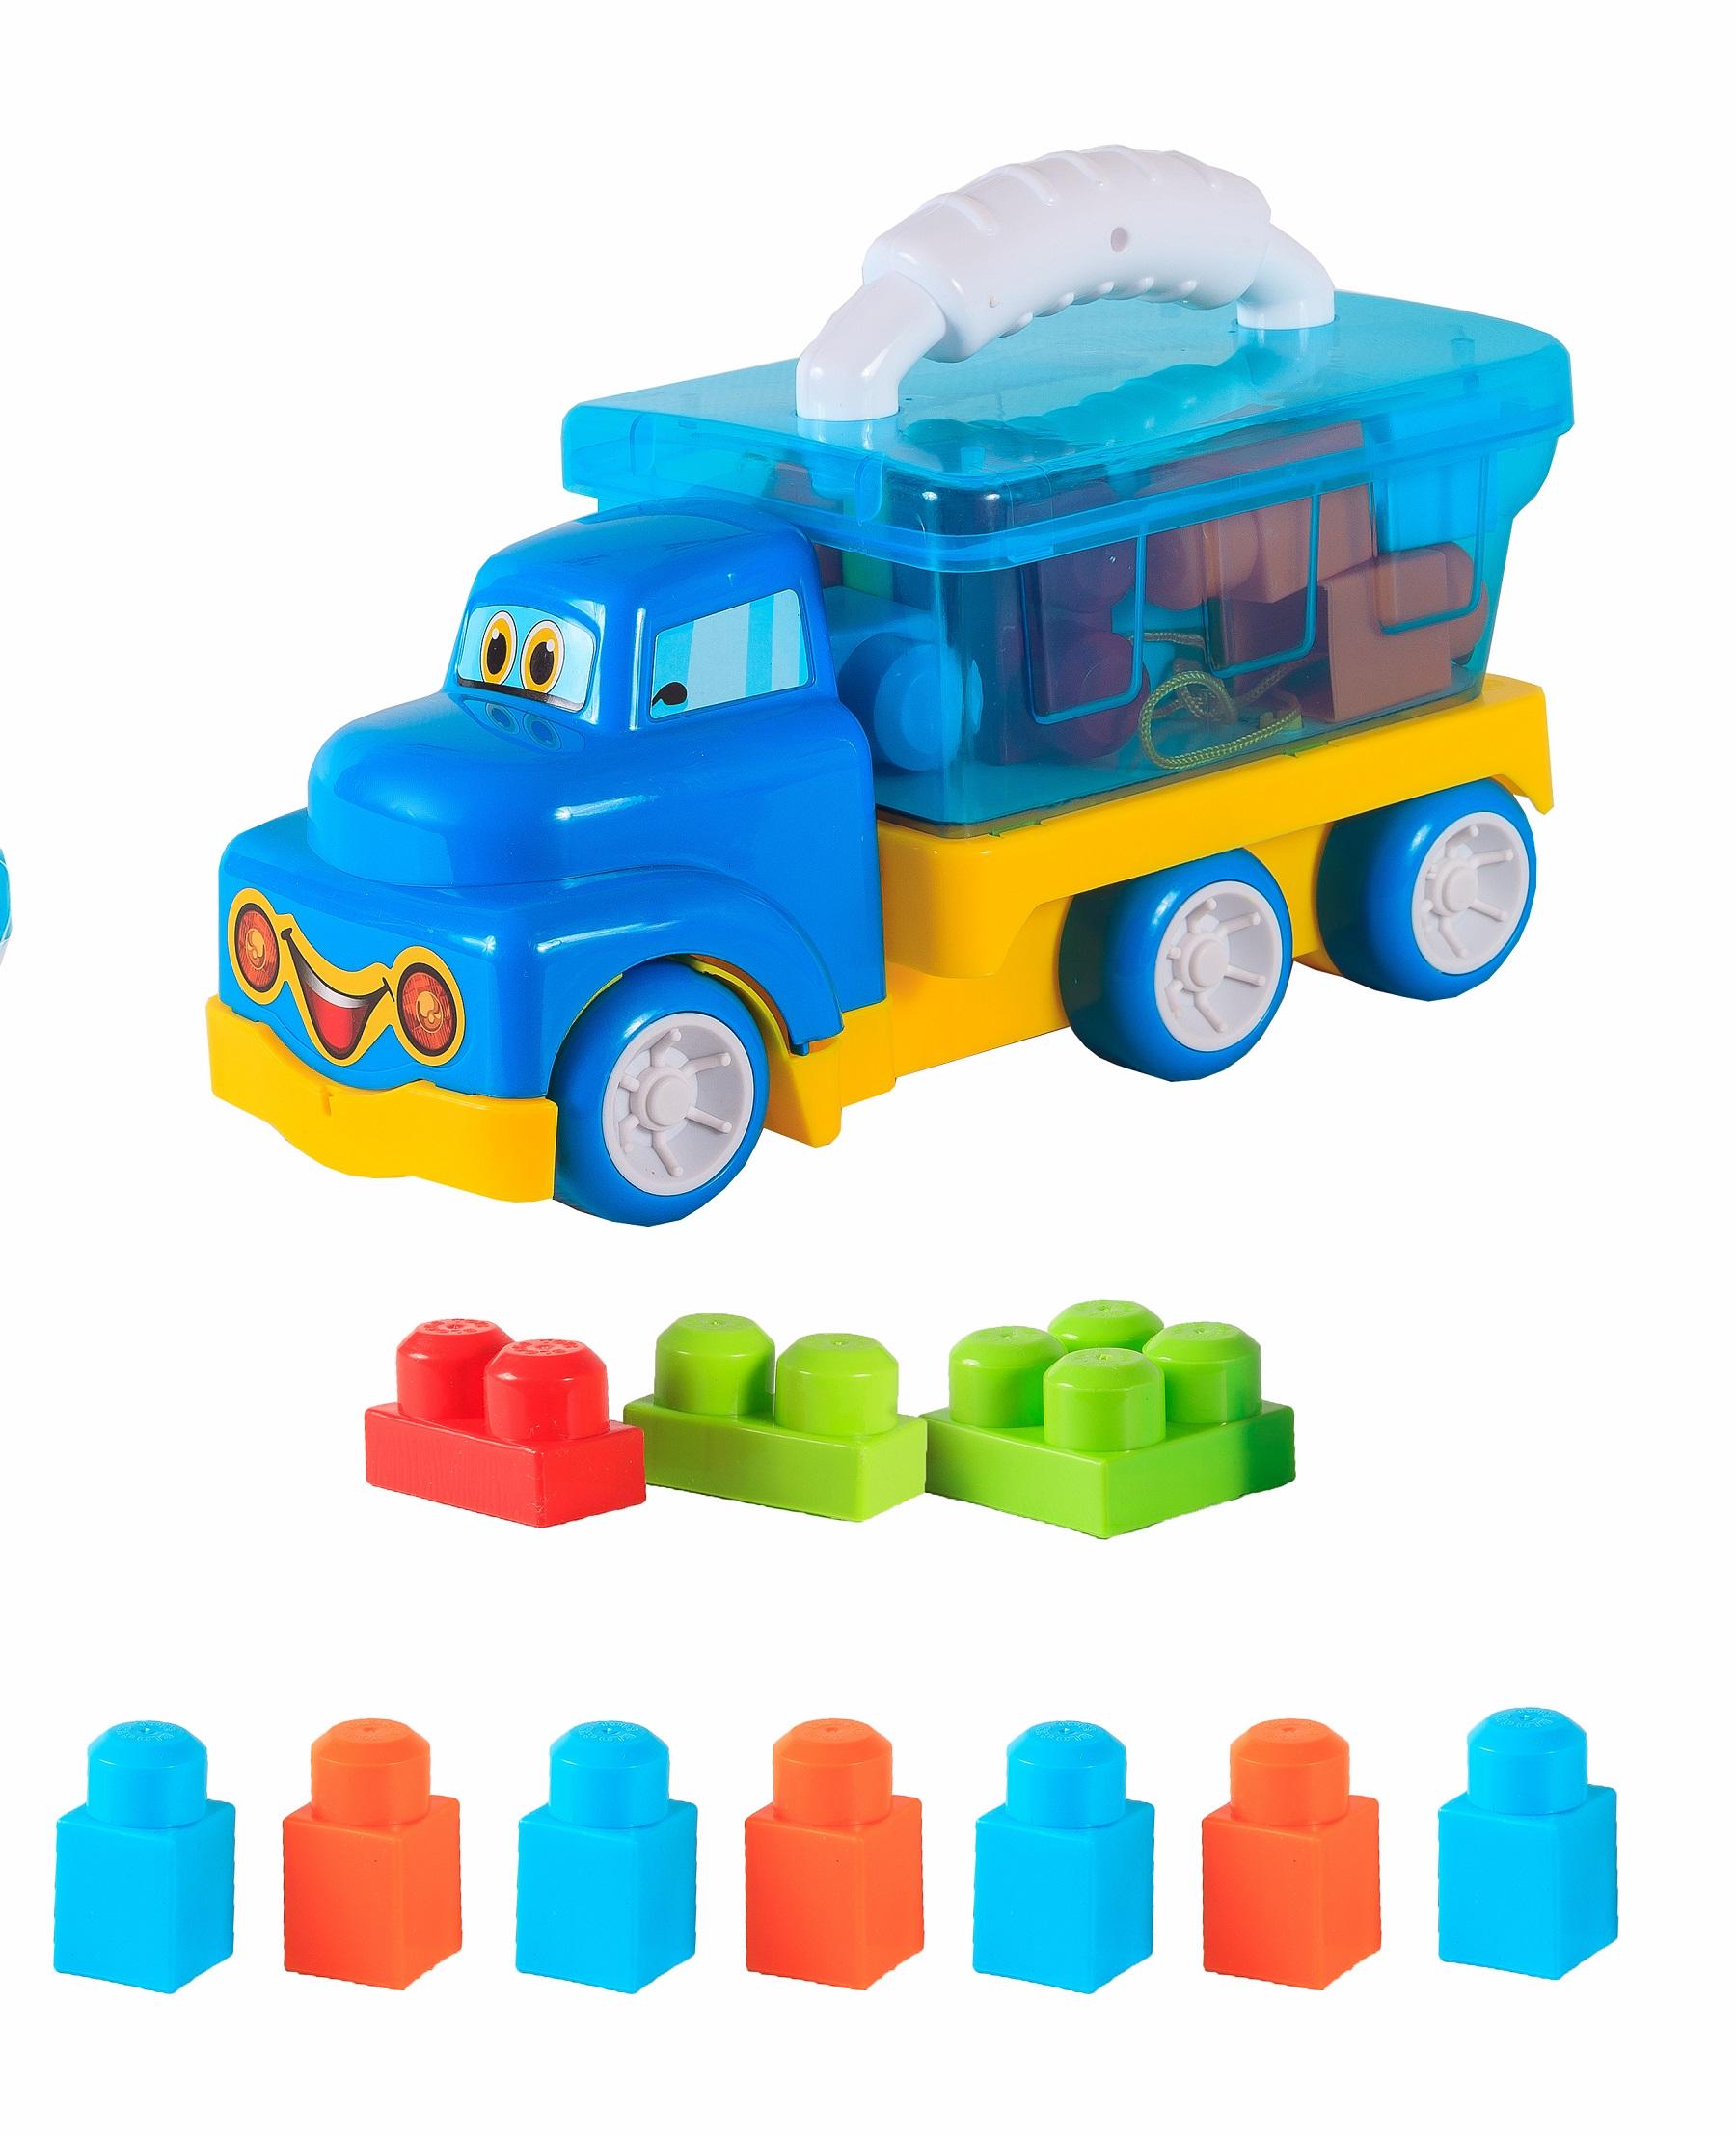 Машинка-игрушка S+S Машина-стройтехника с аксессуарами s s toys 012 03 с фигурками и аксессуарами